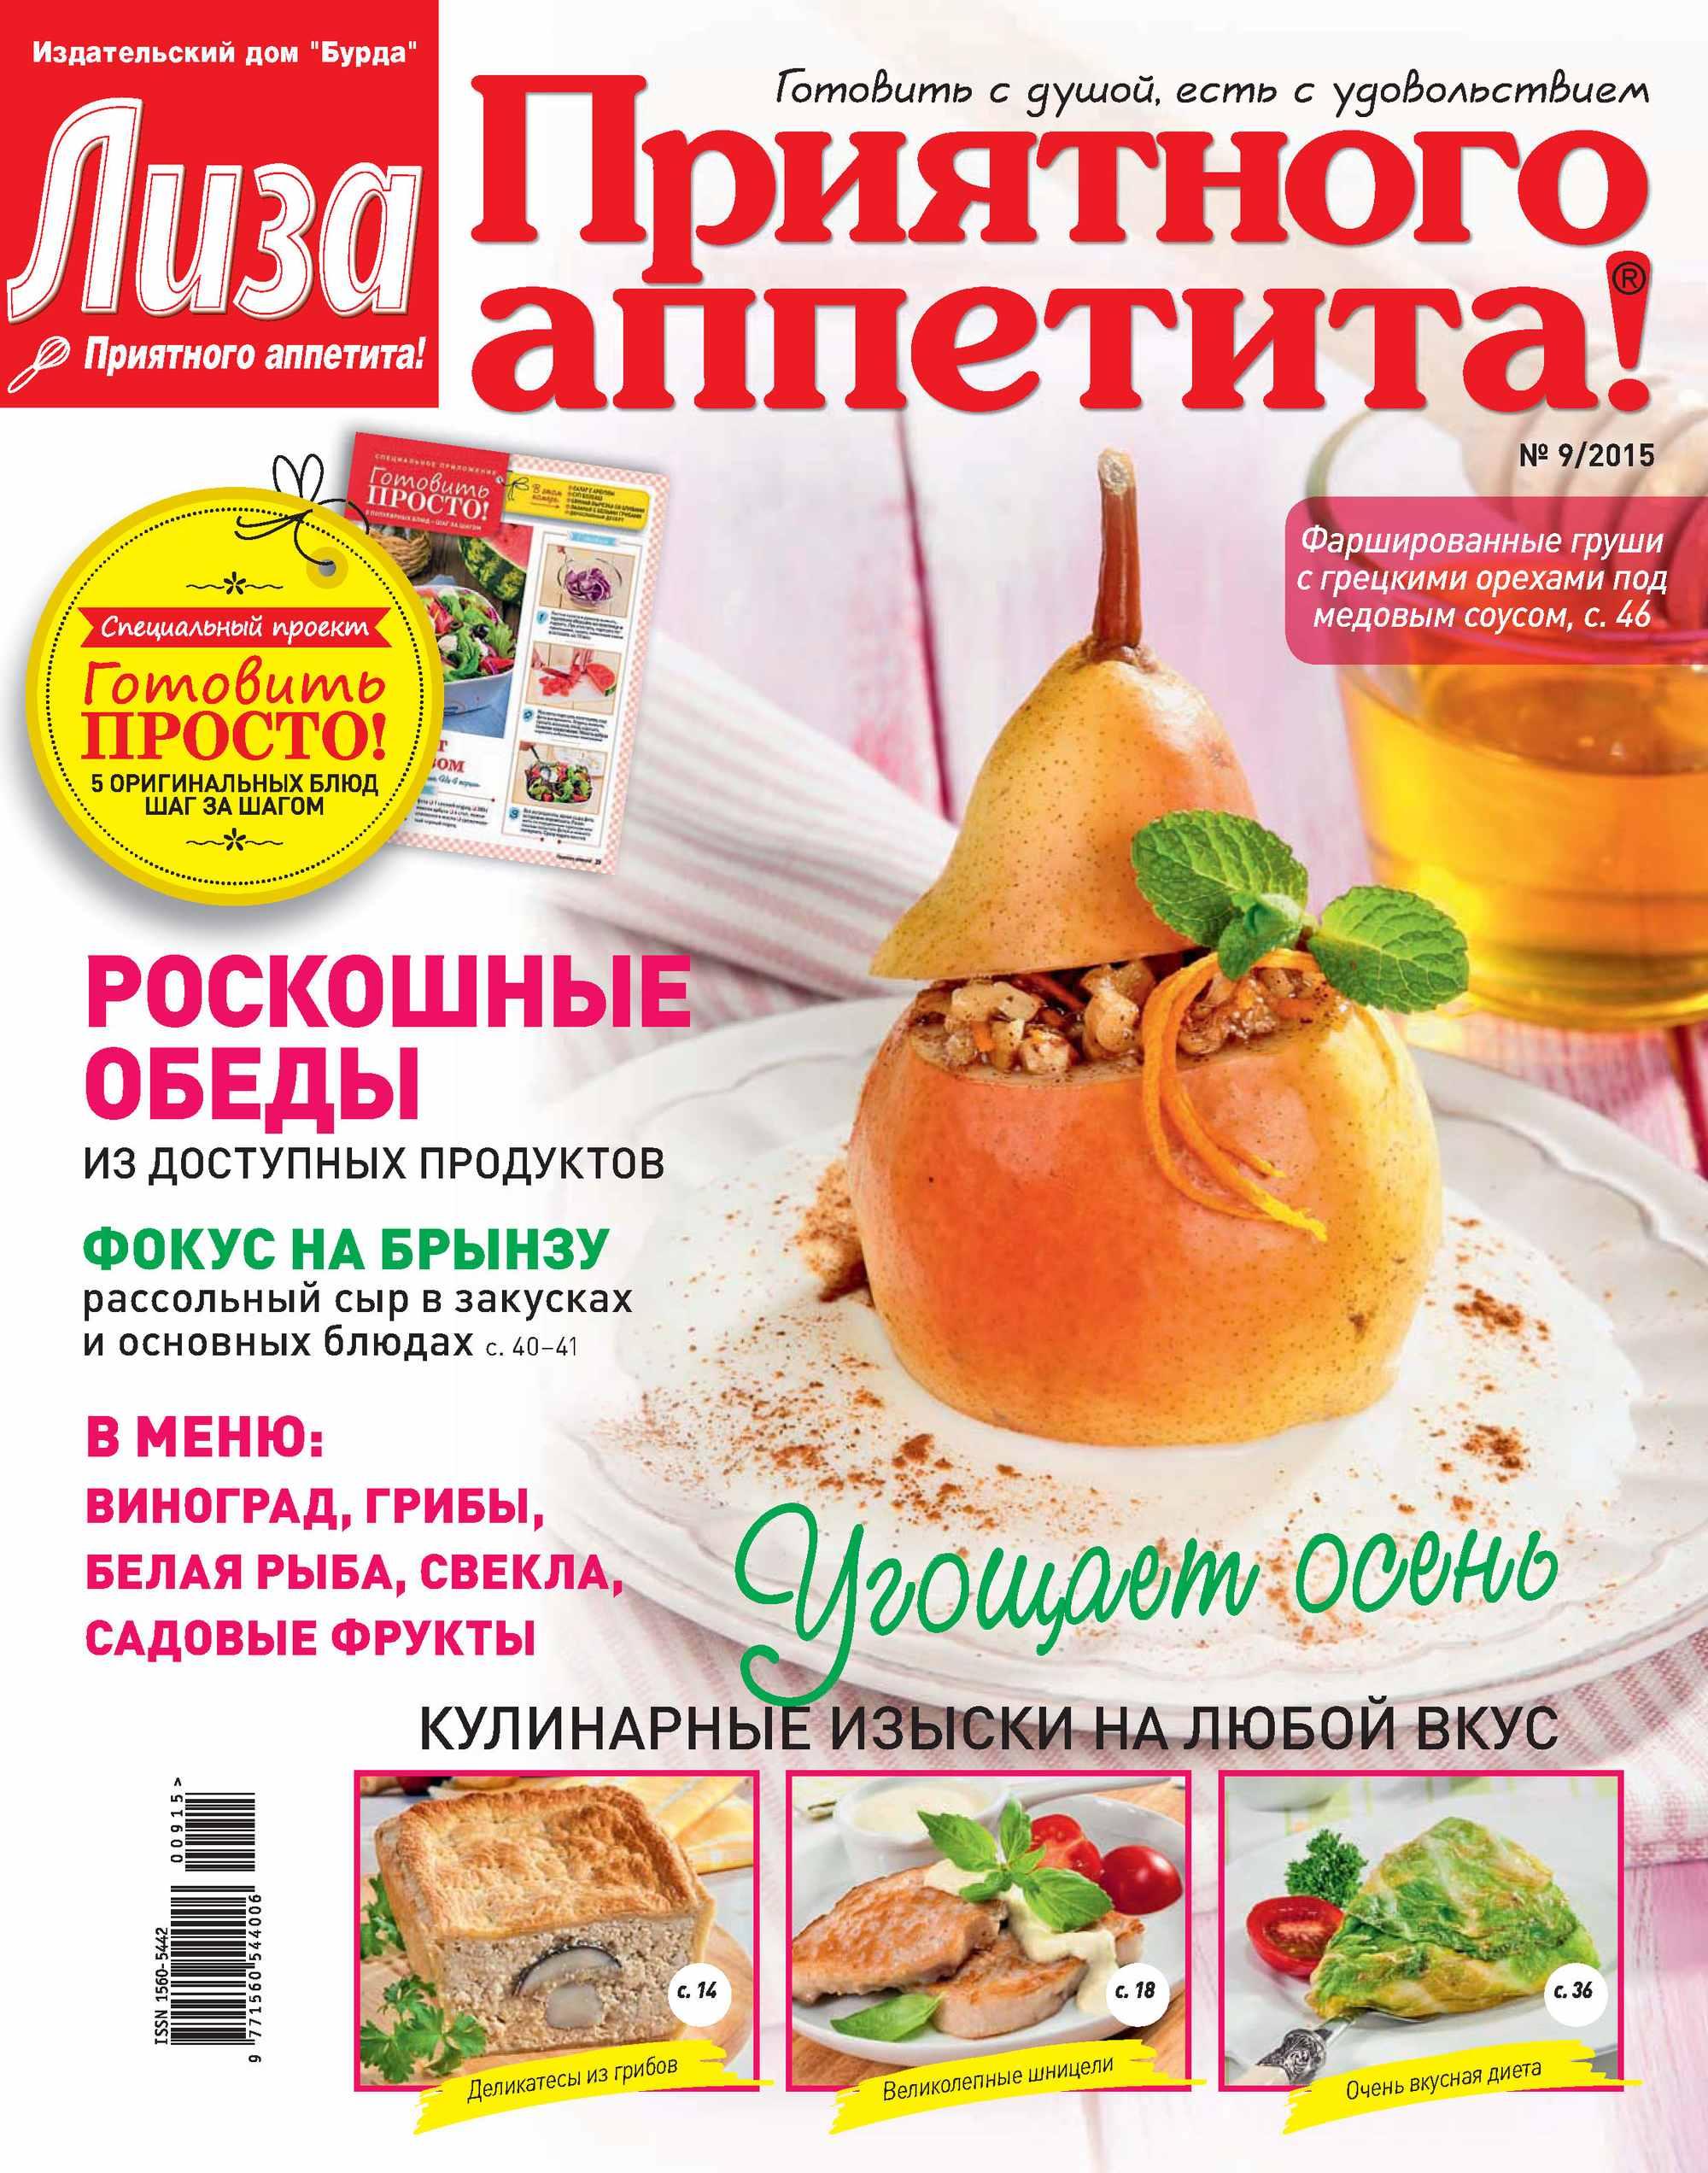 ИД «Бурда» Журнал «Лиза. Приятного аппетита» №09/2015 ид бурда журнал лиза приятного аппетита 04 2015